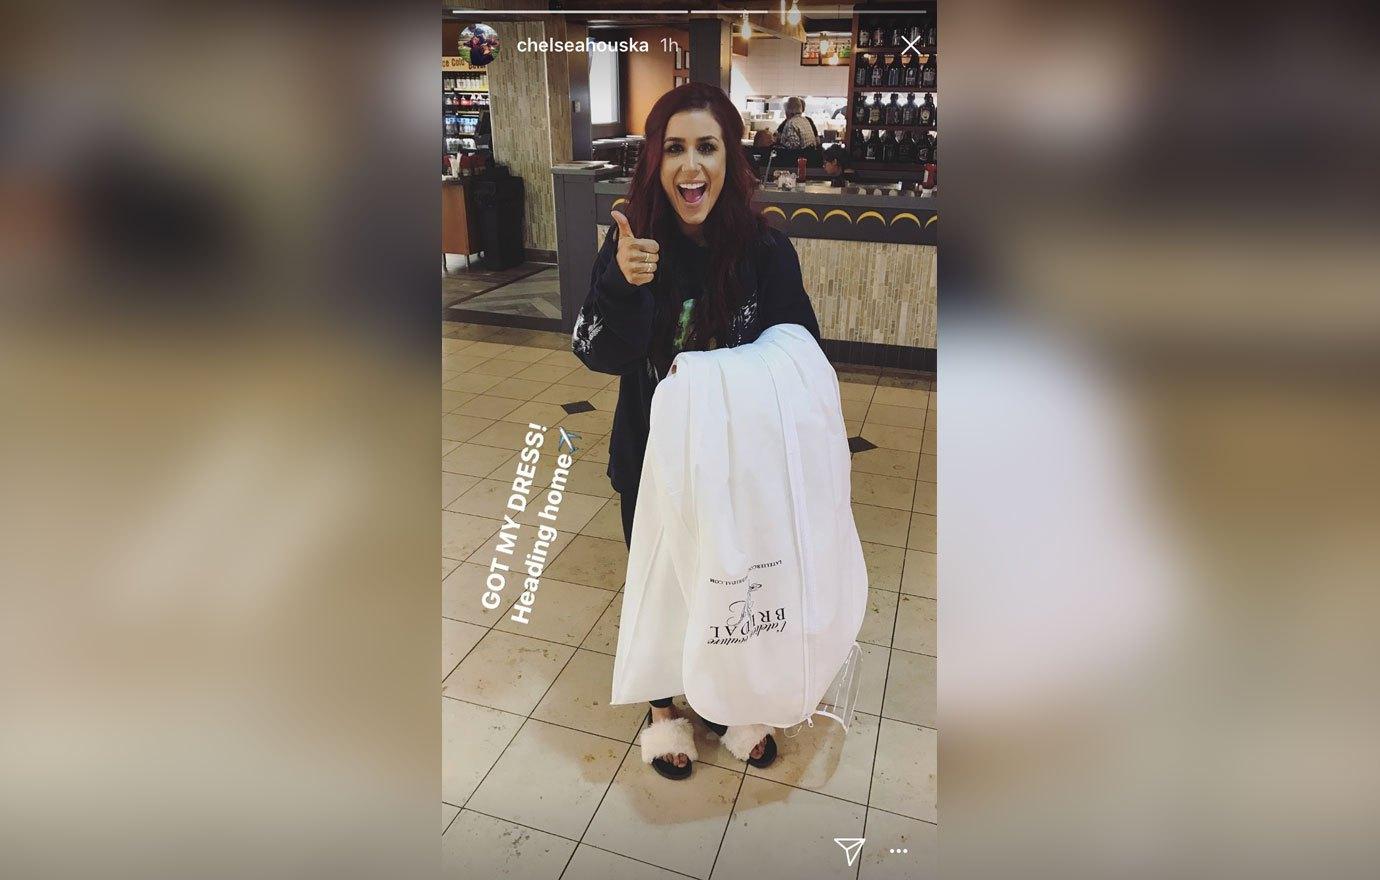 Chelsea Houska Wedding.Chelsea Houska S Dress For Wedding No 2 Has Been Chosen